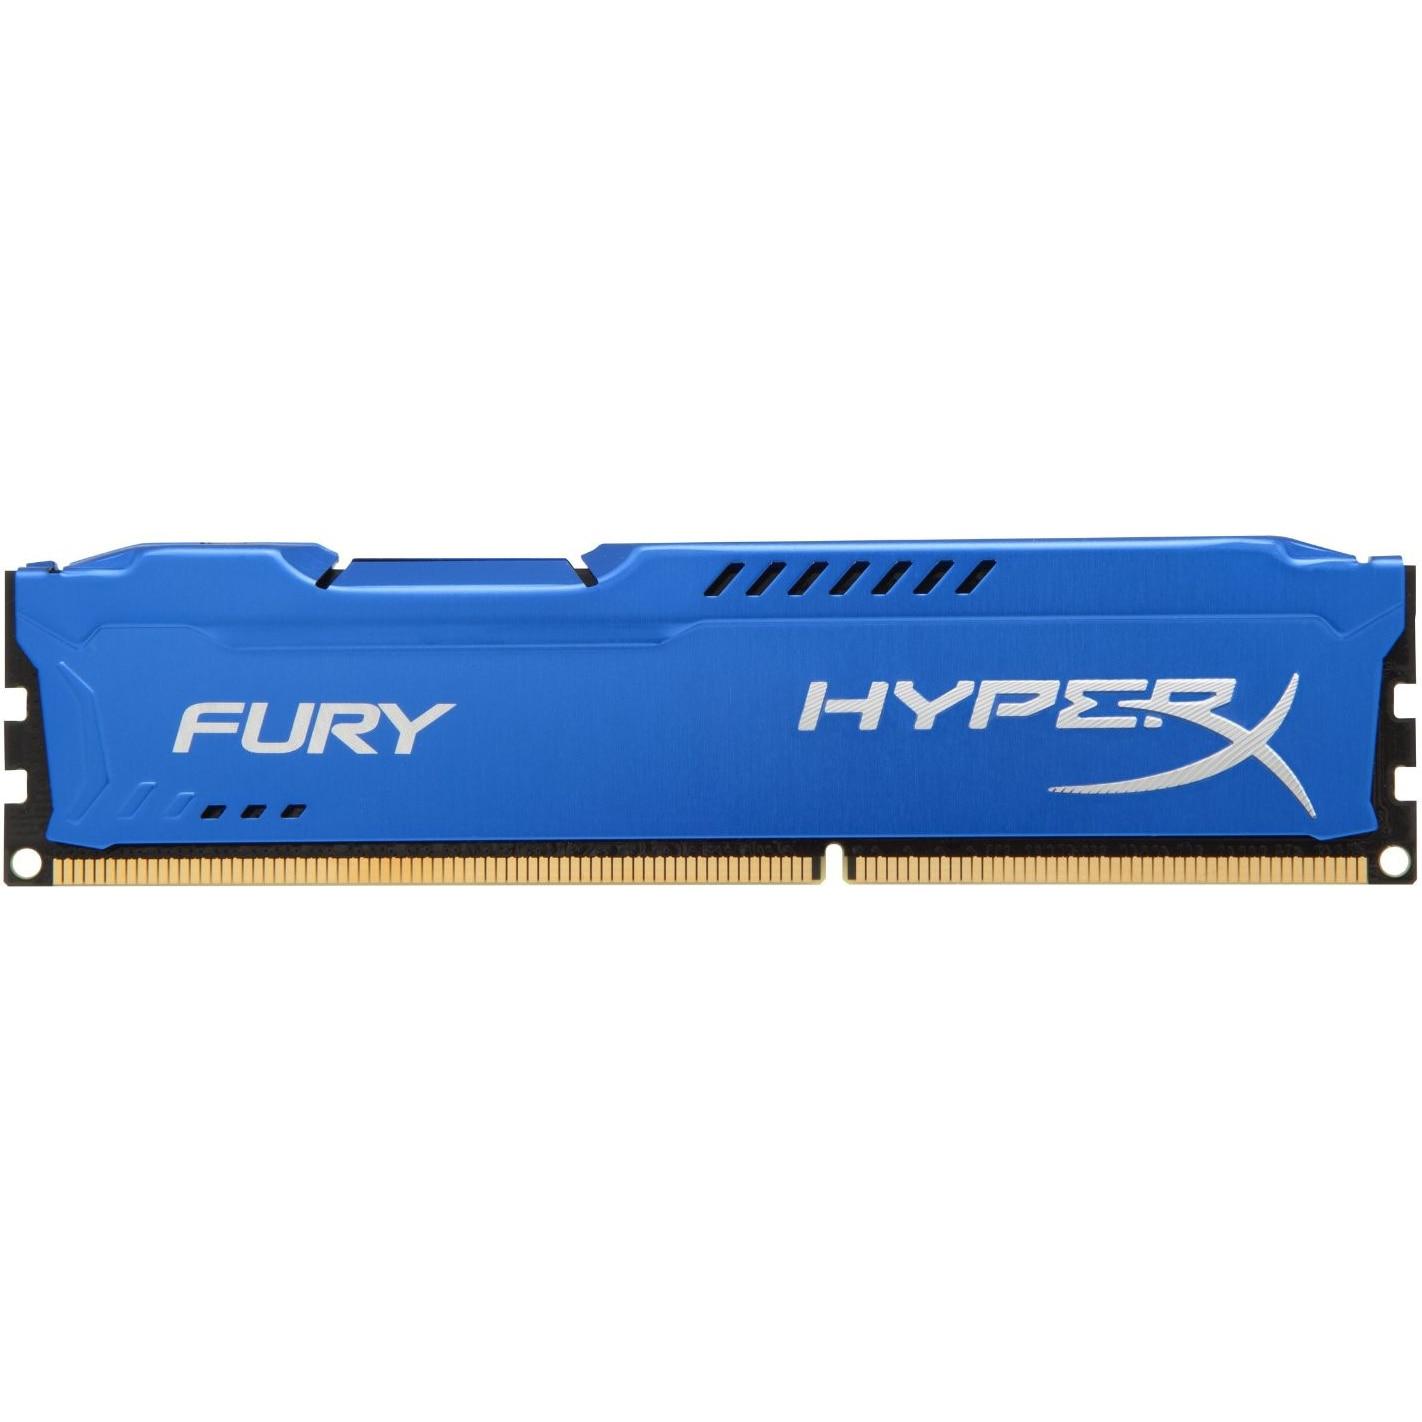 Fotografie Memorie HyperX FURY Blue 4GB, DDR3, 1600MHz, CL10, 1.5V